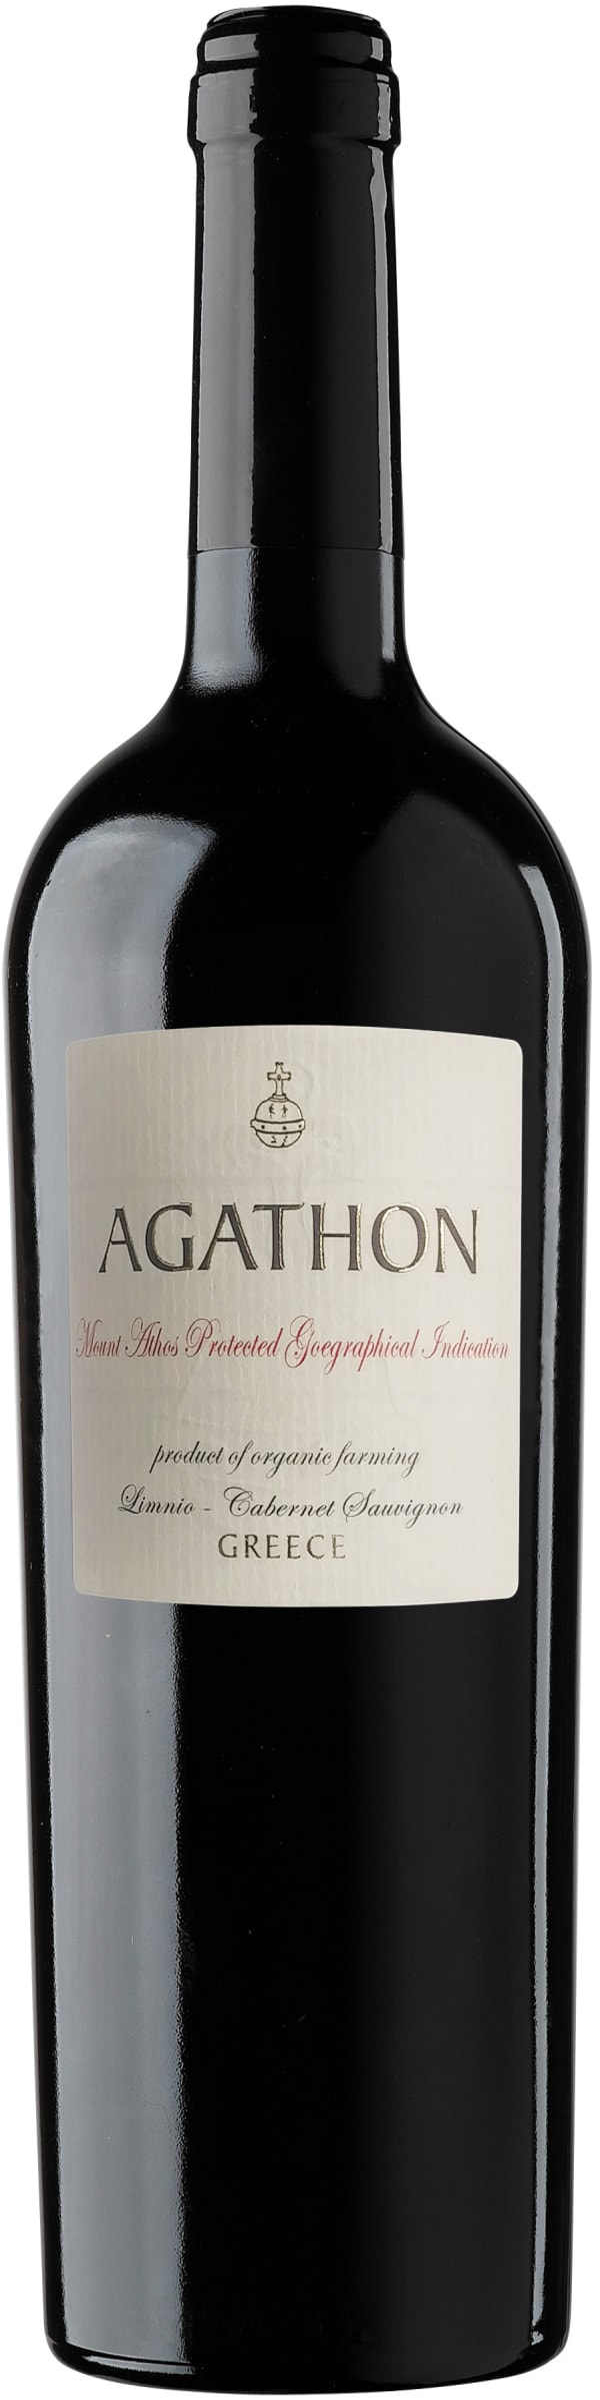 Agathon Limnio Cabernet Sauvignon 2014